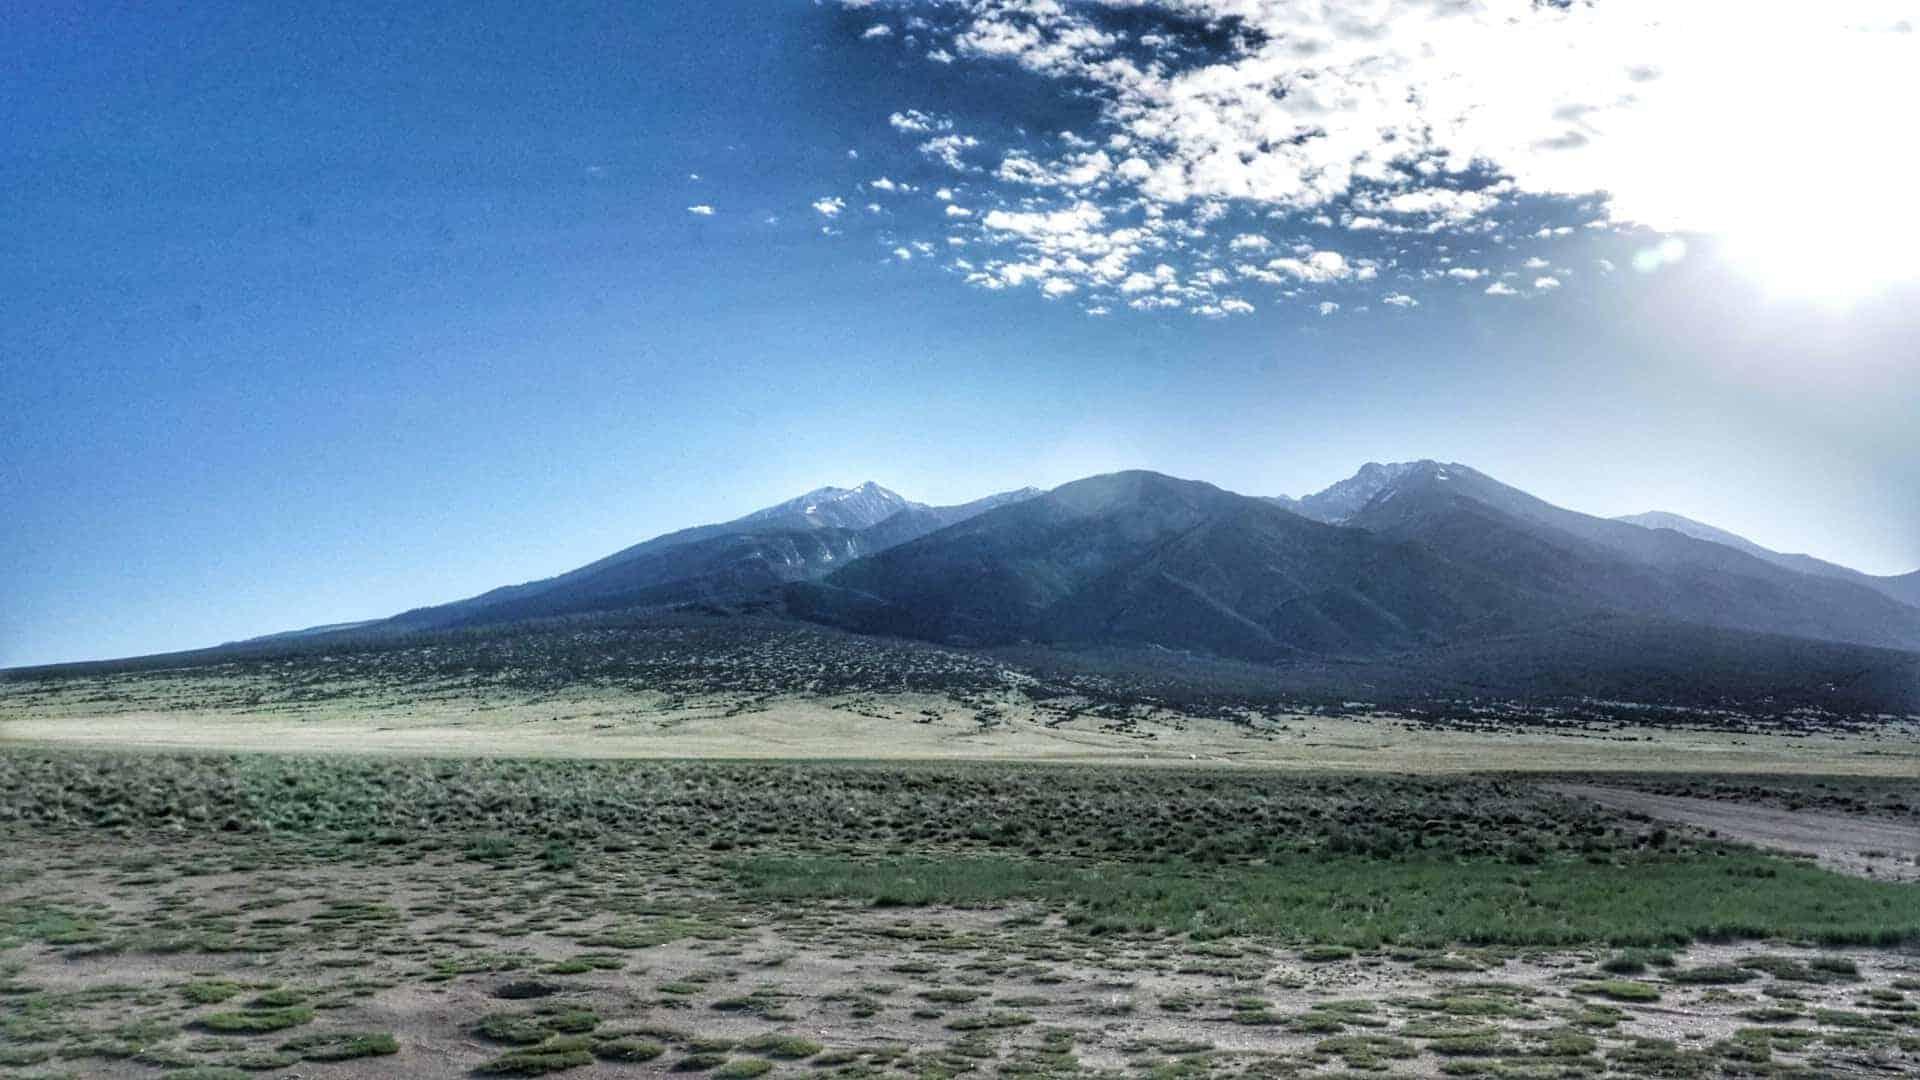 Boondocking Great Sand Dunes National Park 5